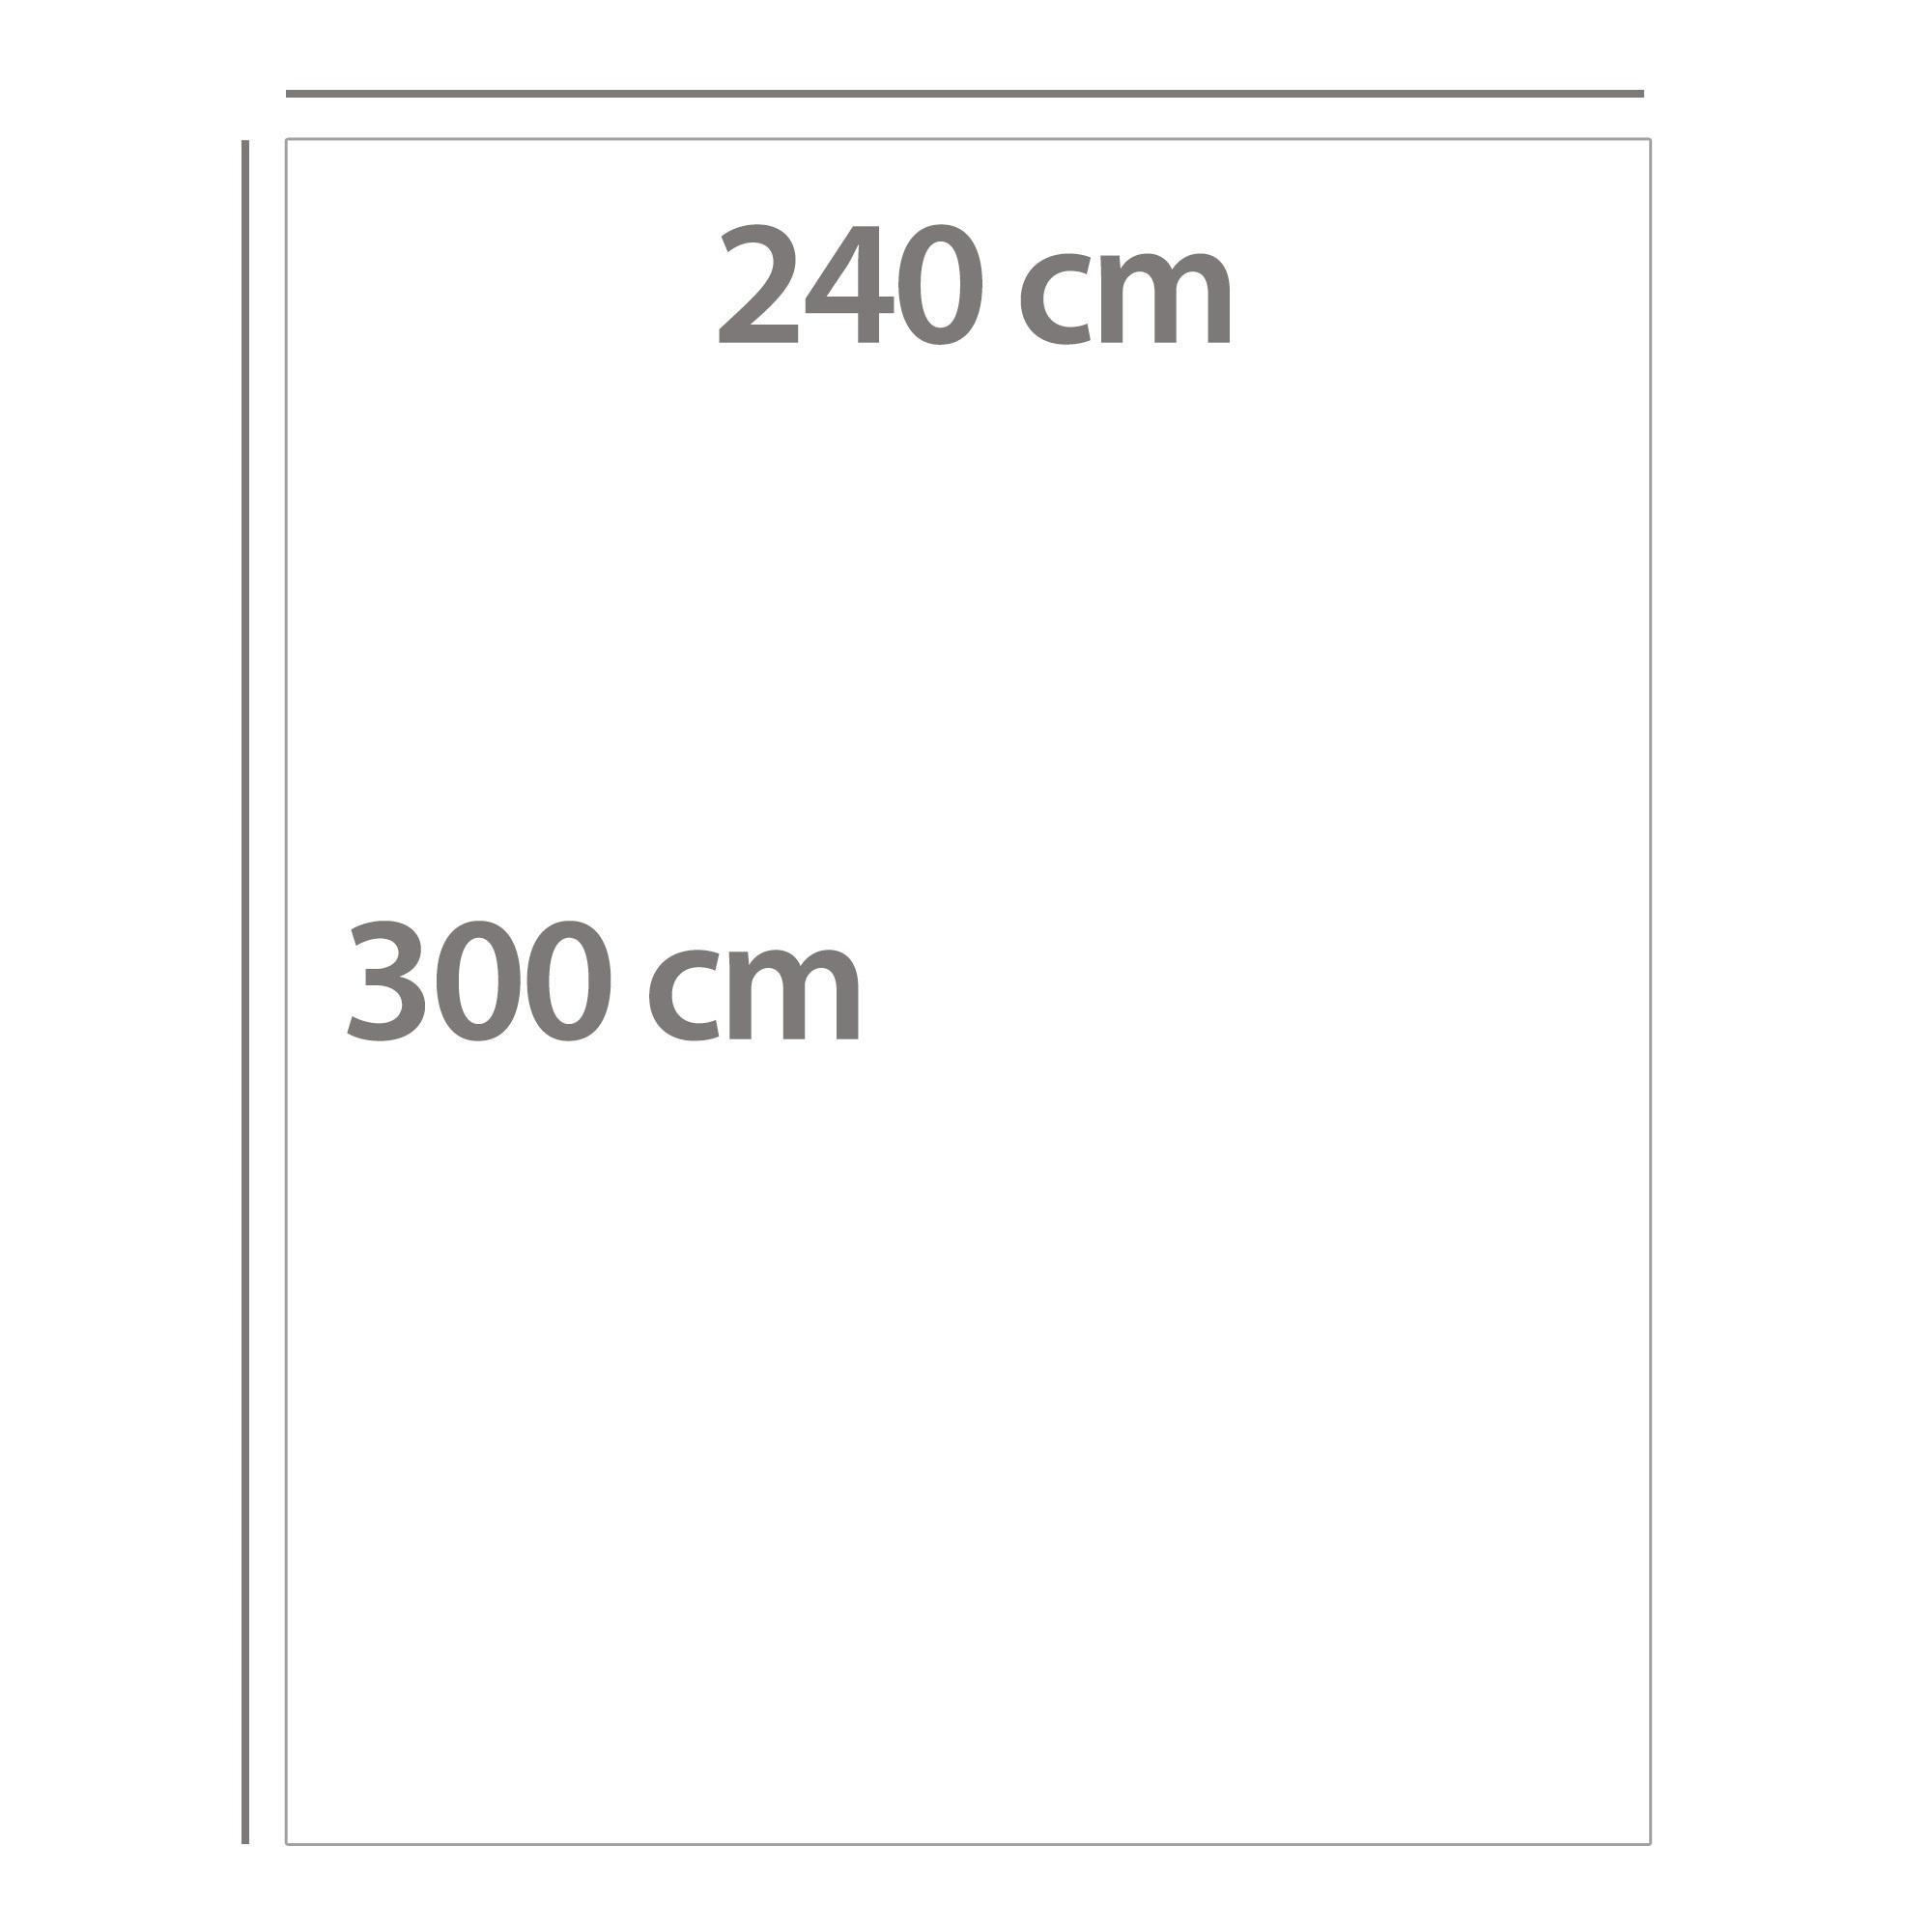 couverture 240x300 pure laine vierge lambswool 360 g m victoria blanc naturel ebay. Black Bedroom Furniture Sets. Home Design Ideas